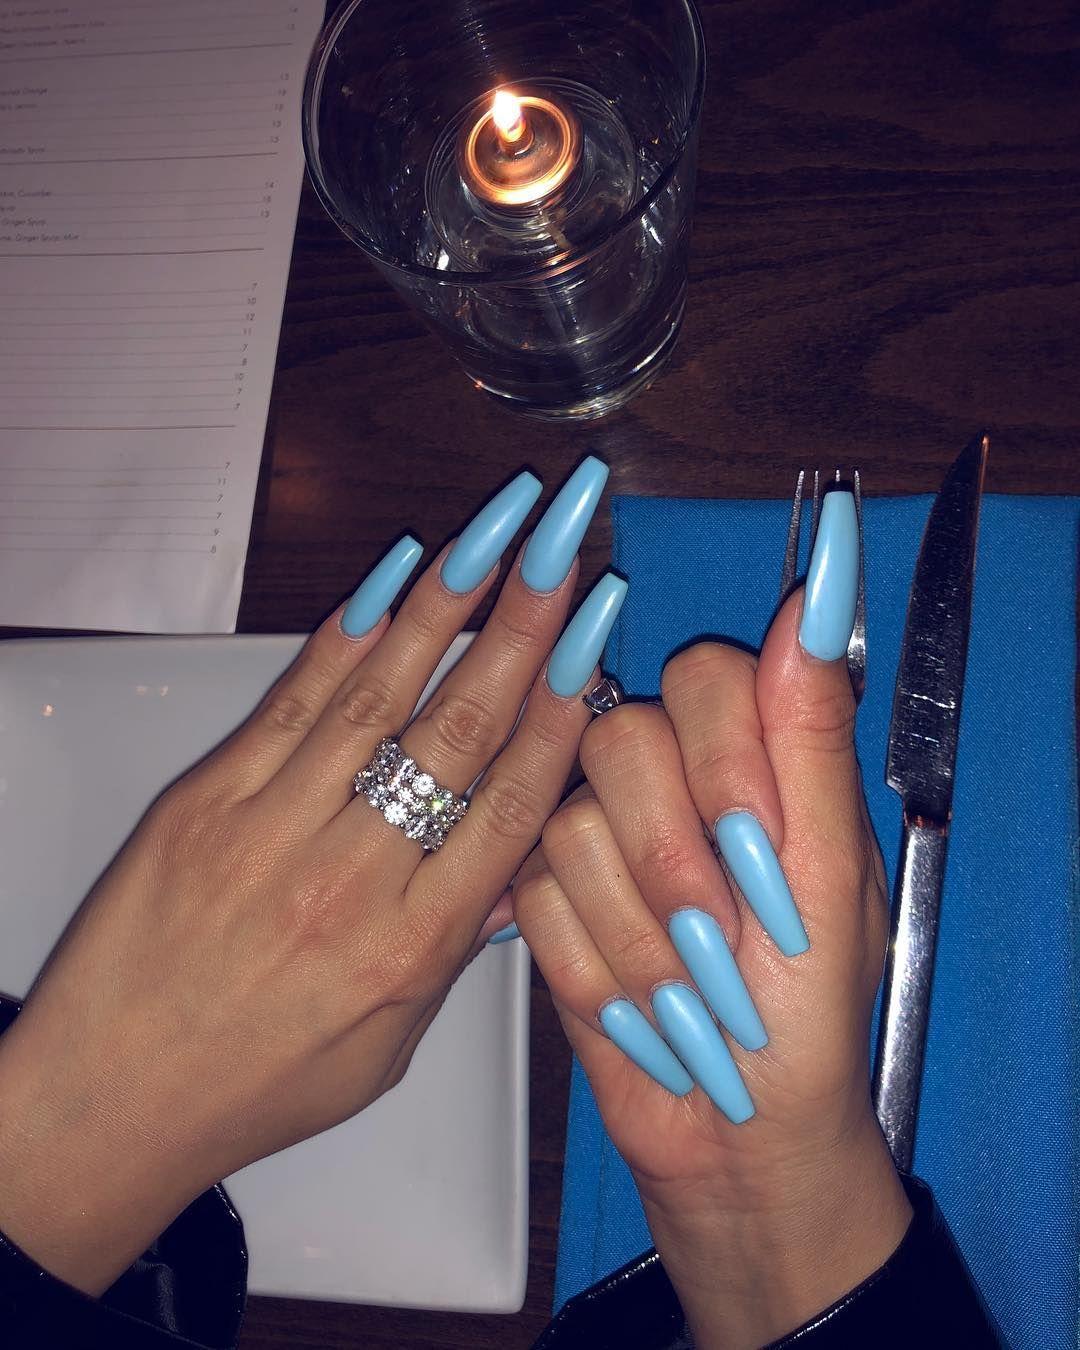 Karla J On Instagram Baby Blue Baby Blue Acrylic Nails Blue Acrylic Nails Baby Blue Nails